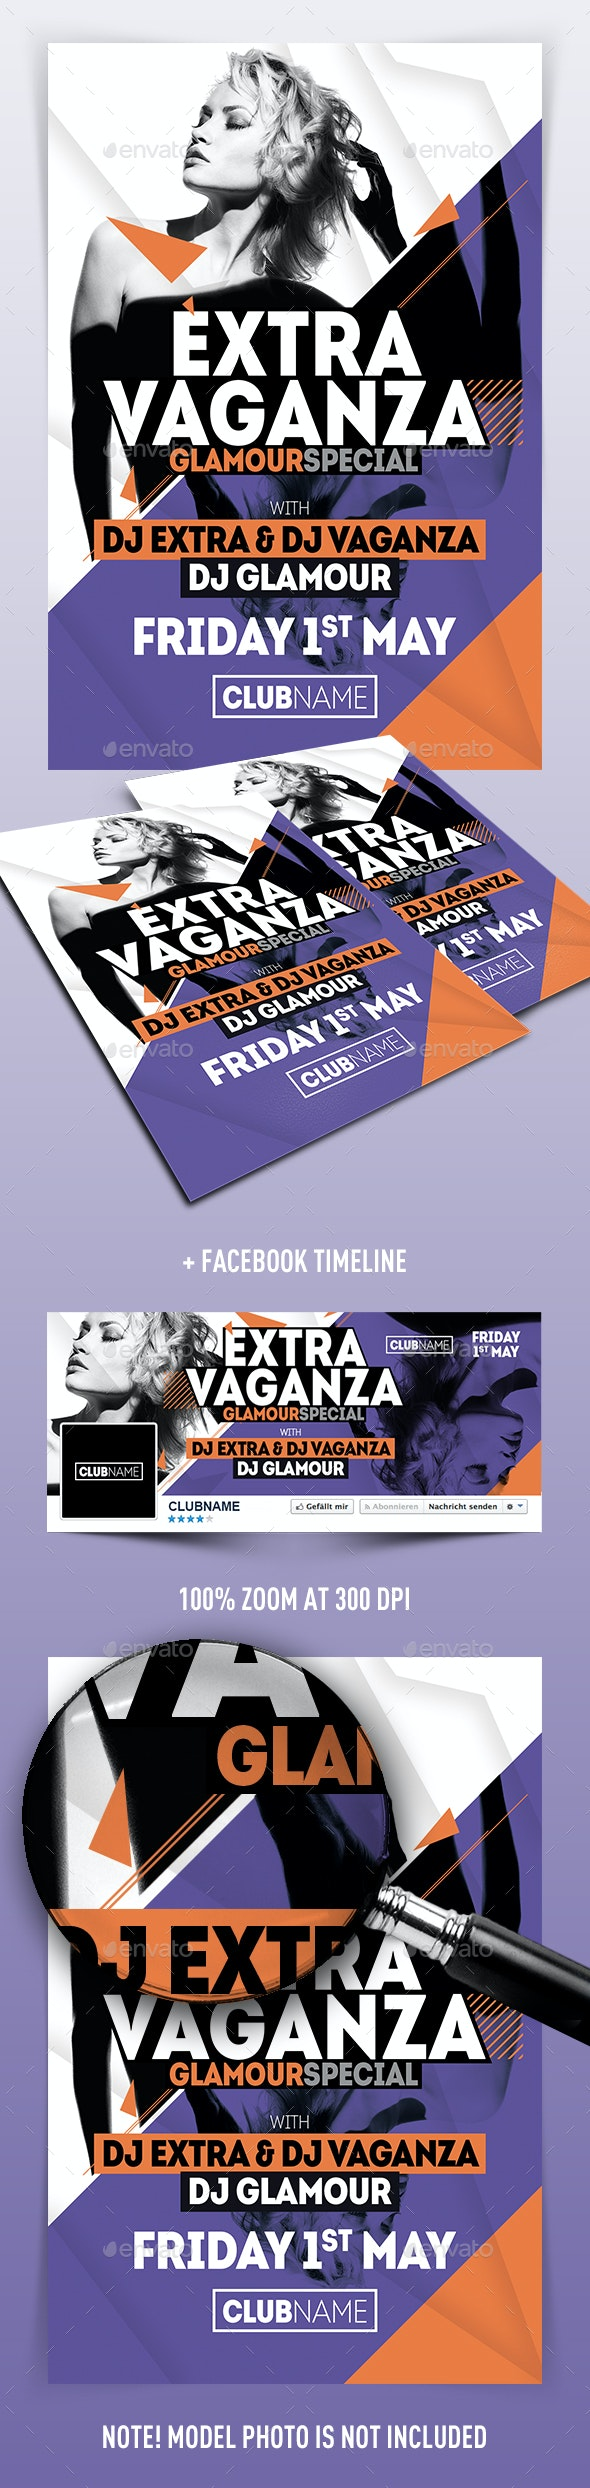 Extravaganza Flyer - Clubs & Parties Events